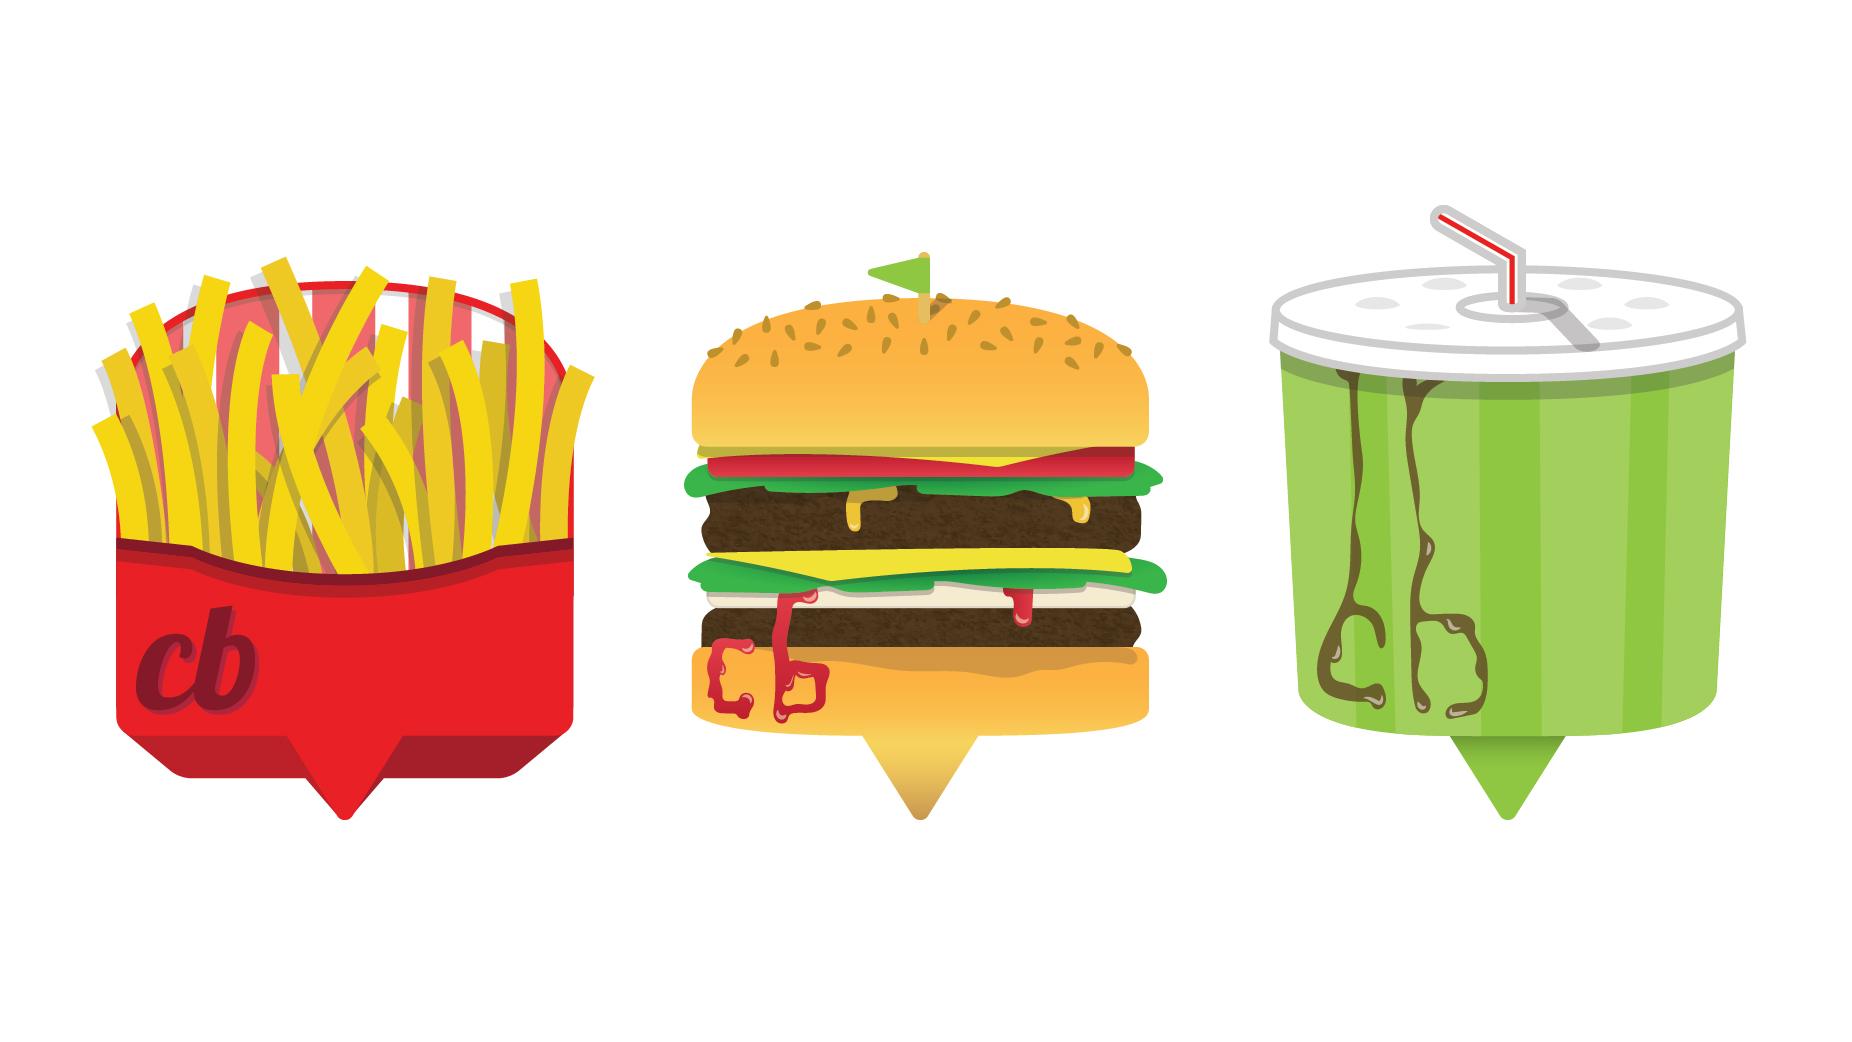 CB_Illustrated_Icons copy-11.jpg